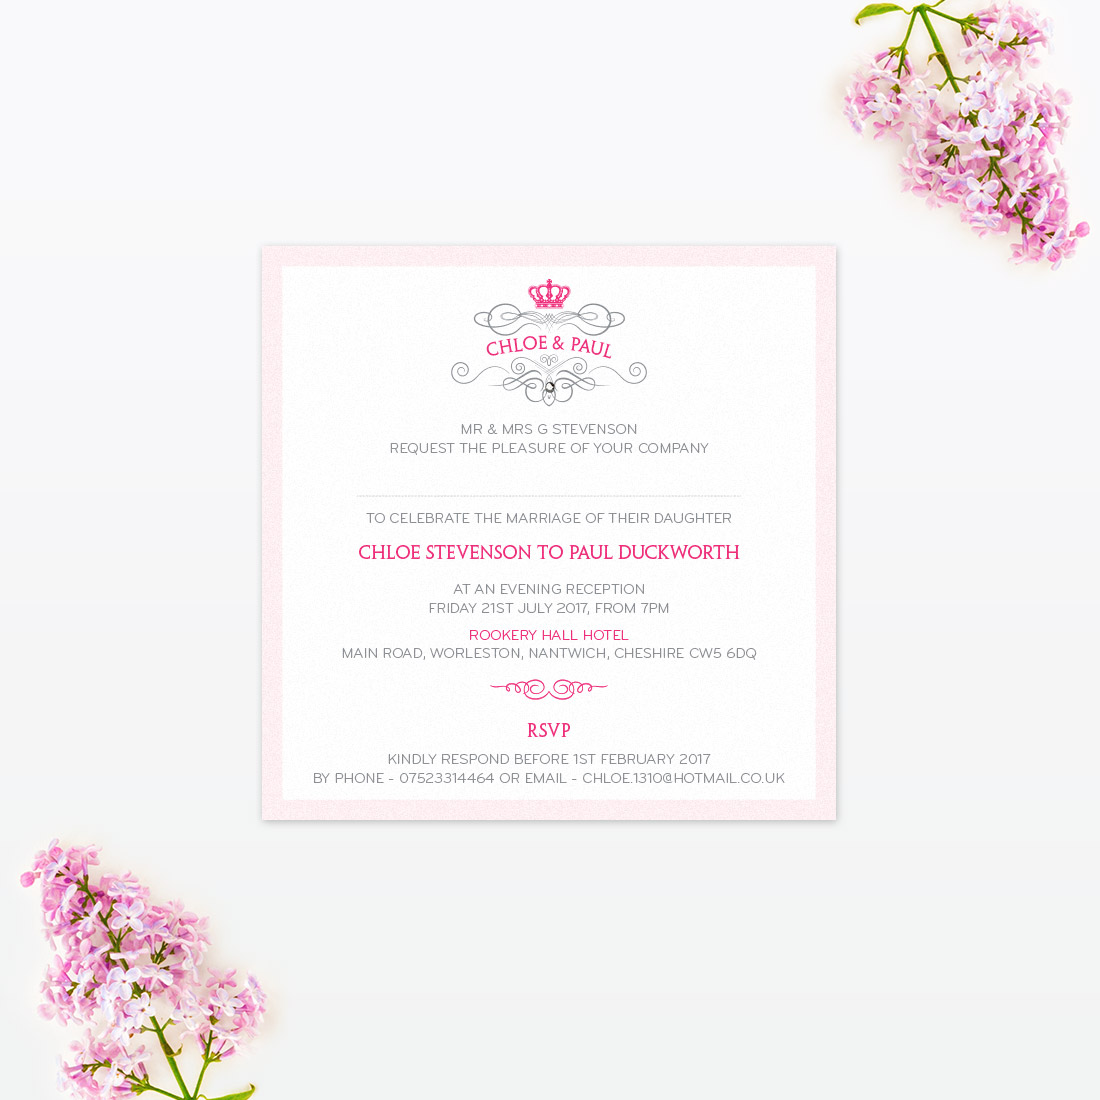 Royal Elegance Wedding Invitation - Love Invited - Luxury Wedding ...